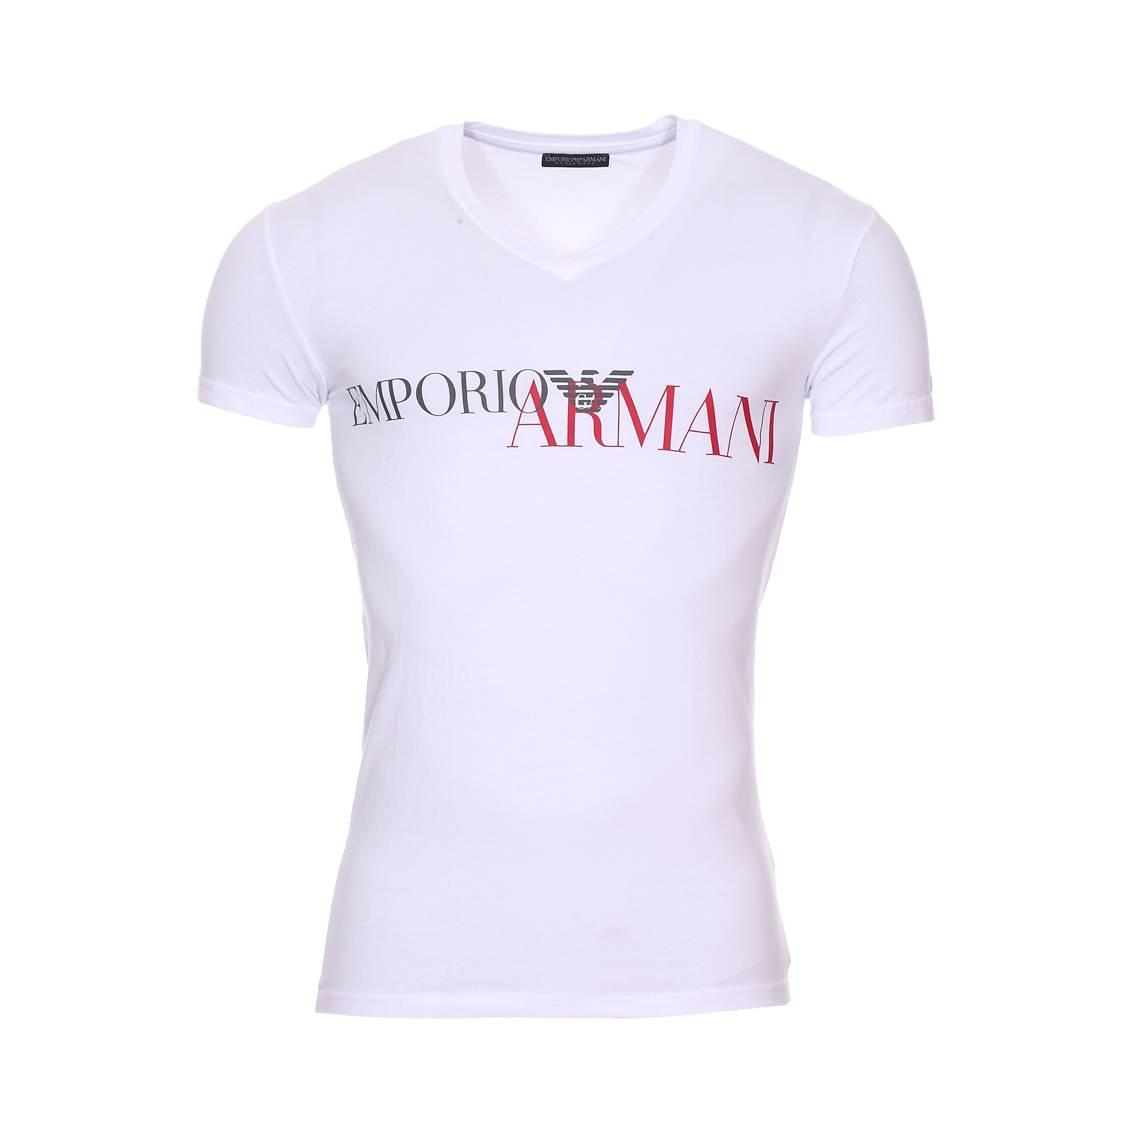 29d0c62a64ae Tee-shirt col V Emporio Armani en coton stretch blanc floqué en ...